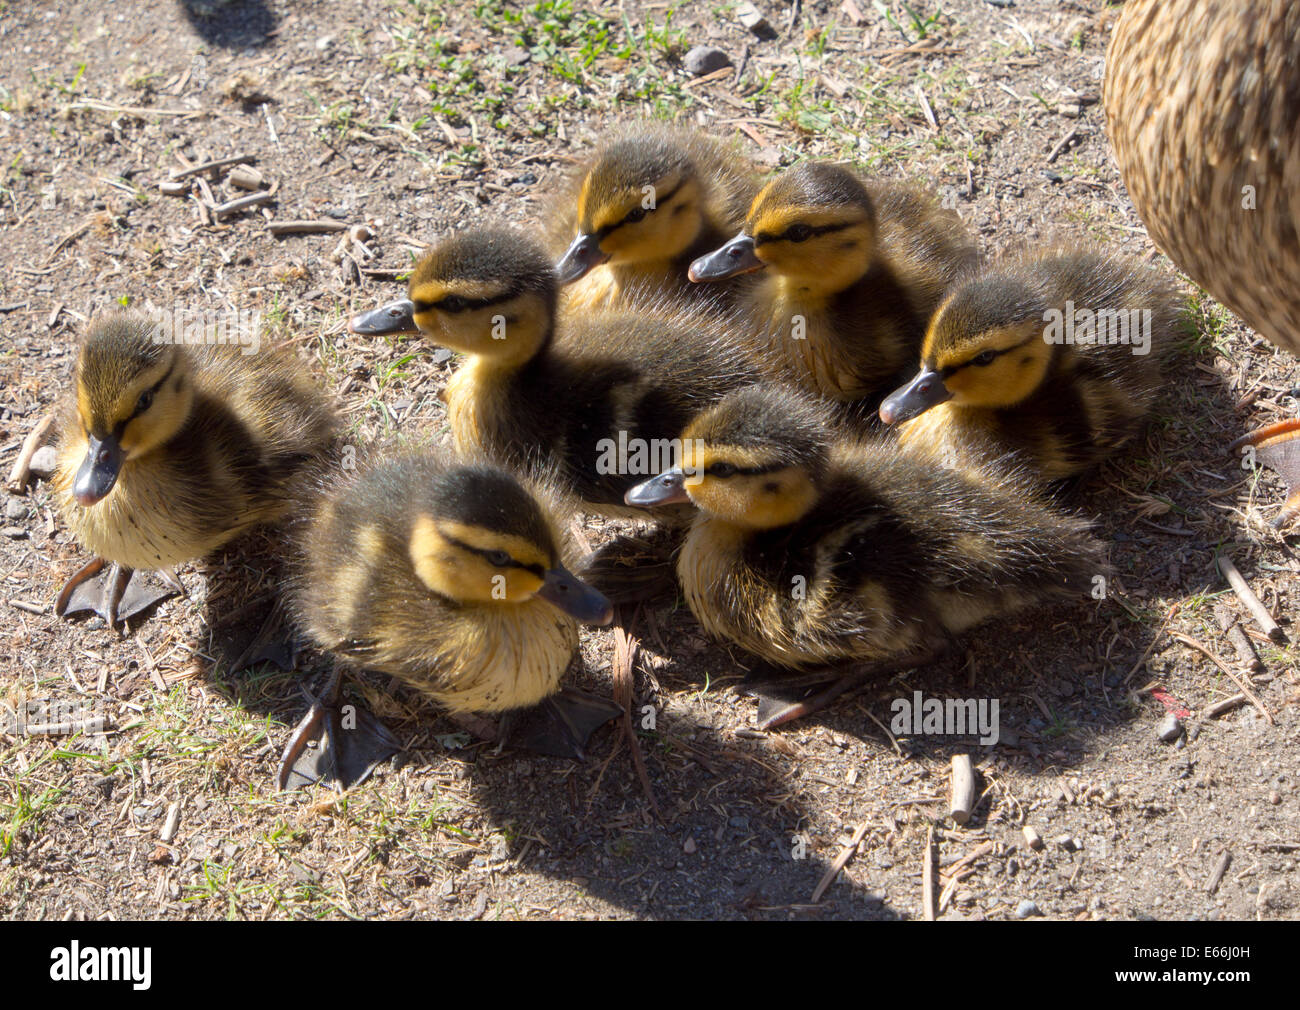 Seven mallard ducklings on dry land, Oslo Norway - Stock Image